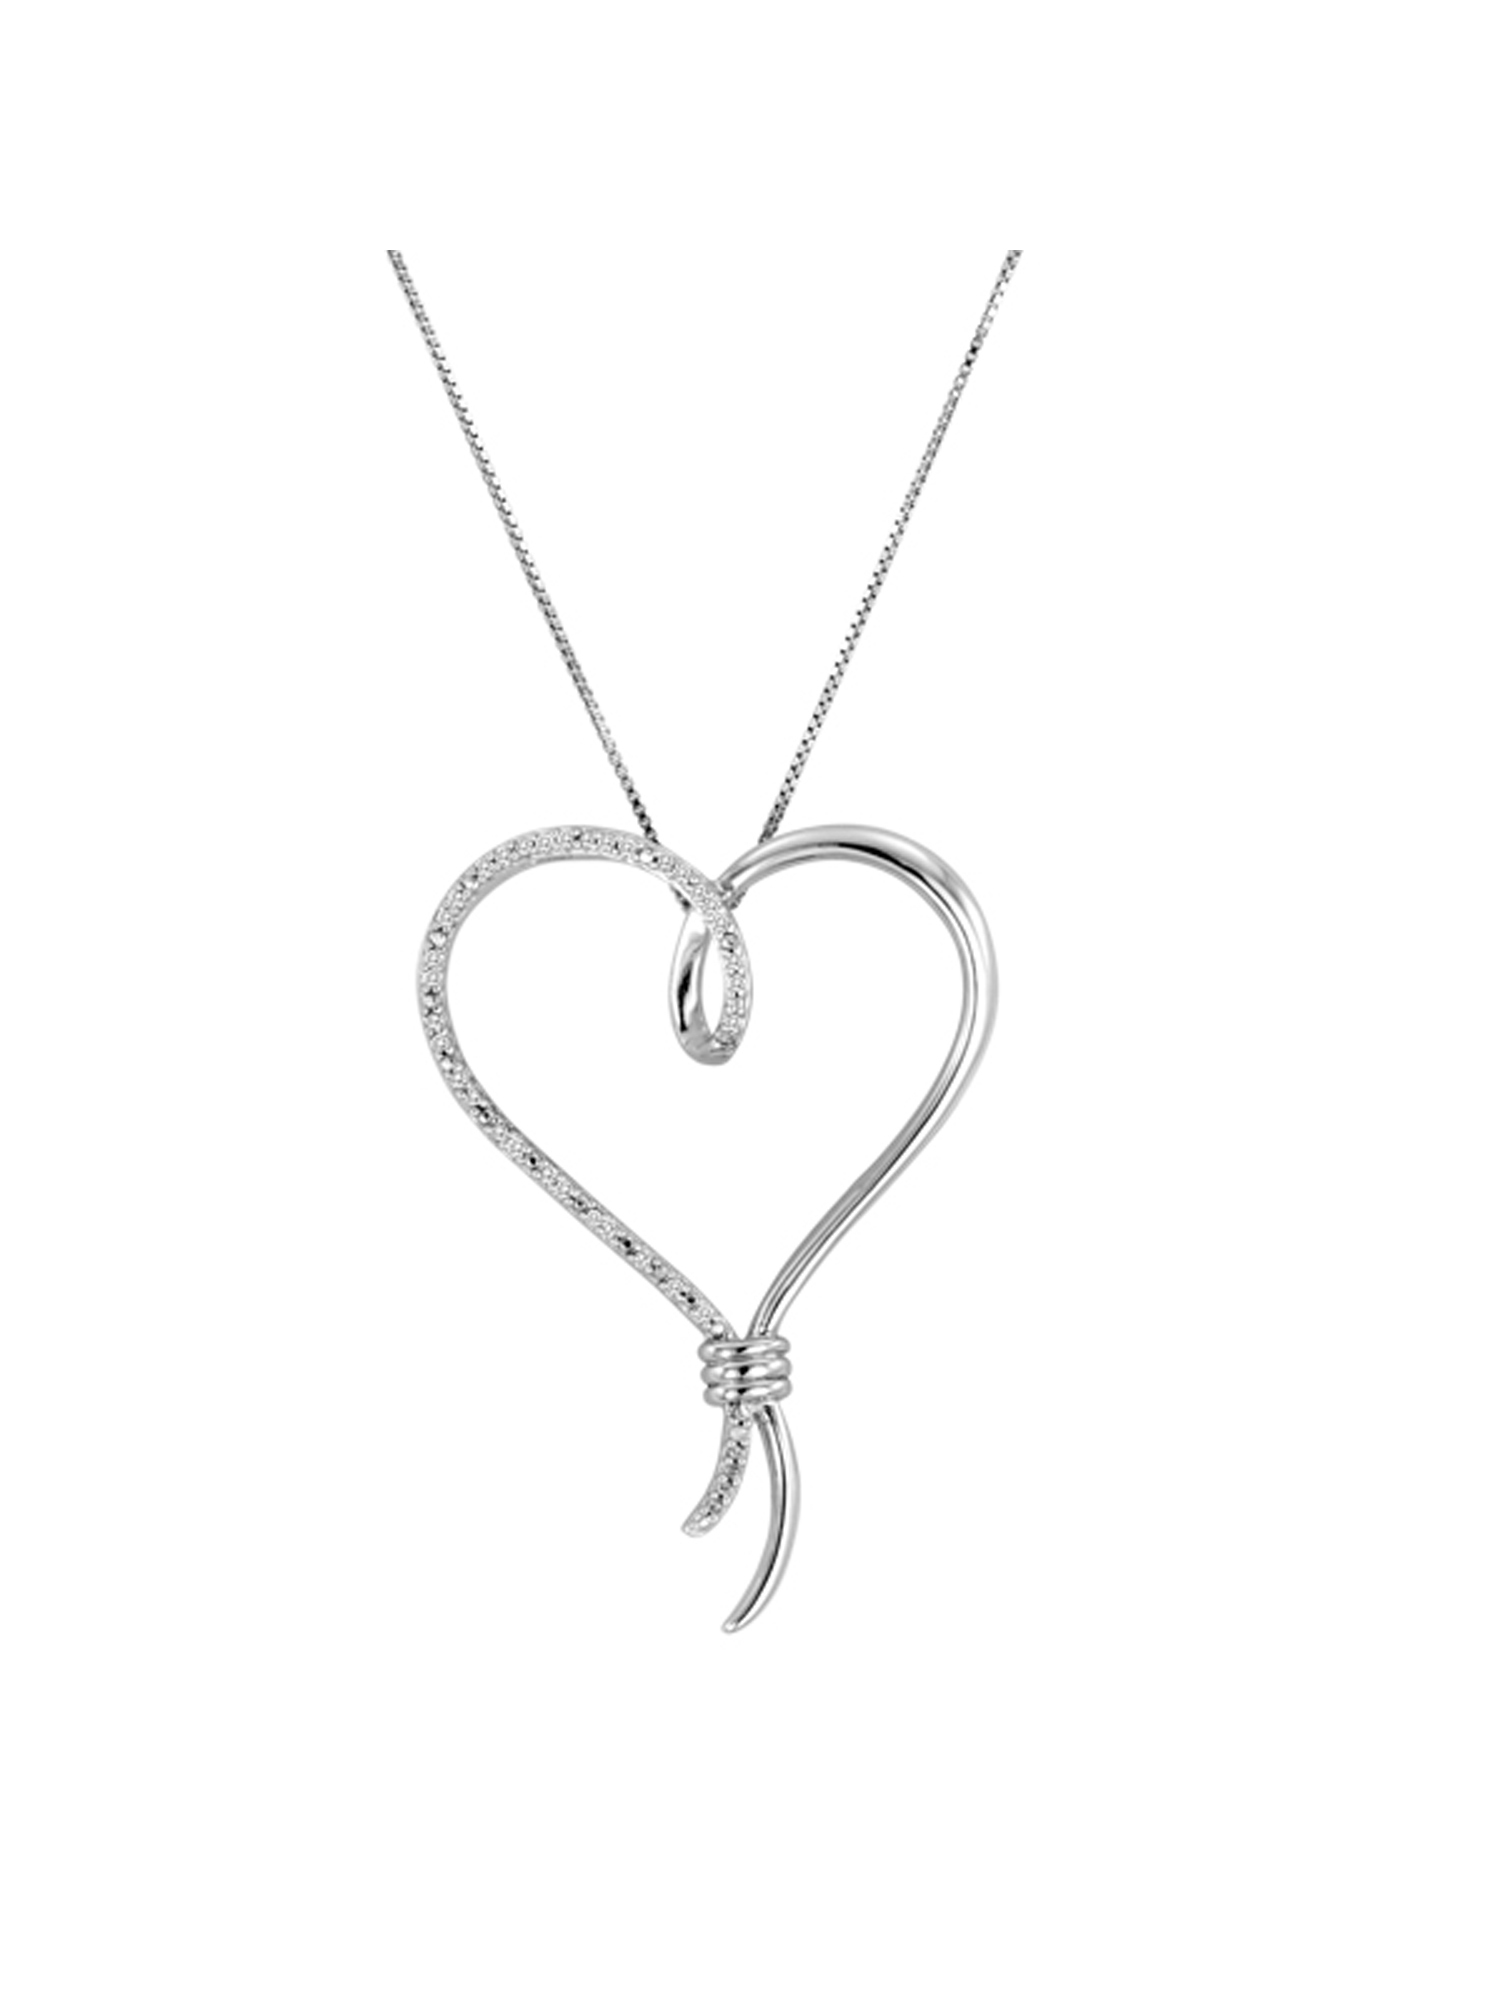 Sterling Silver 1/10 Carat T.W. Diamond Over-Sized Heart Pendant, 18